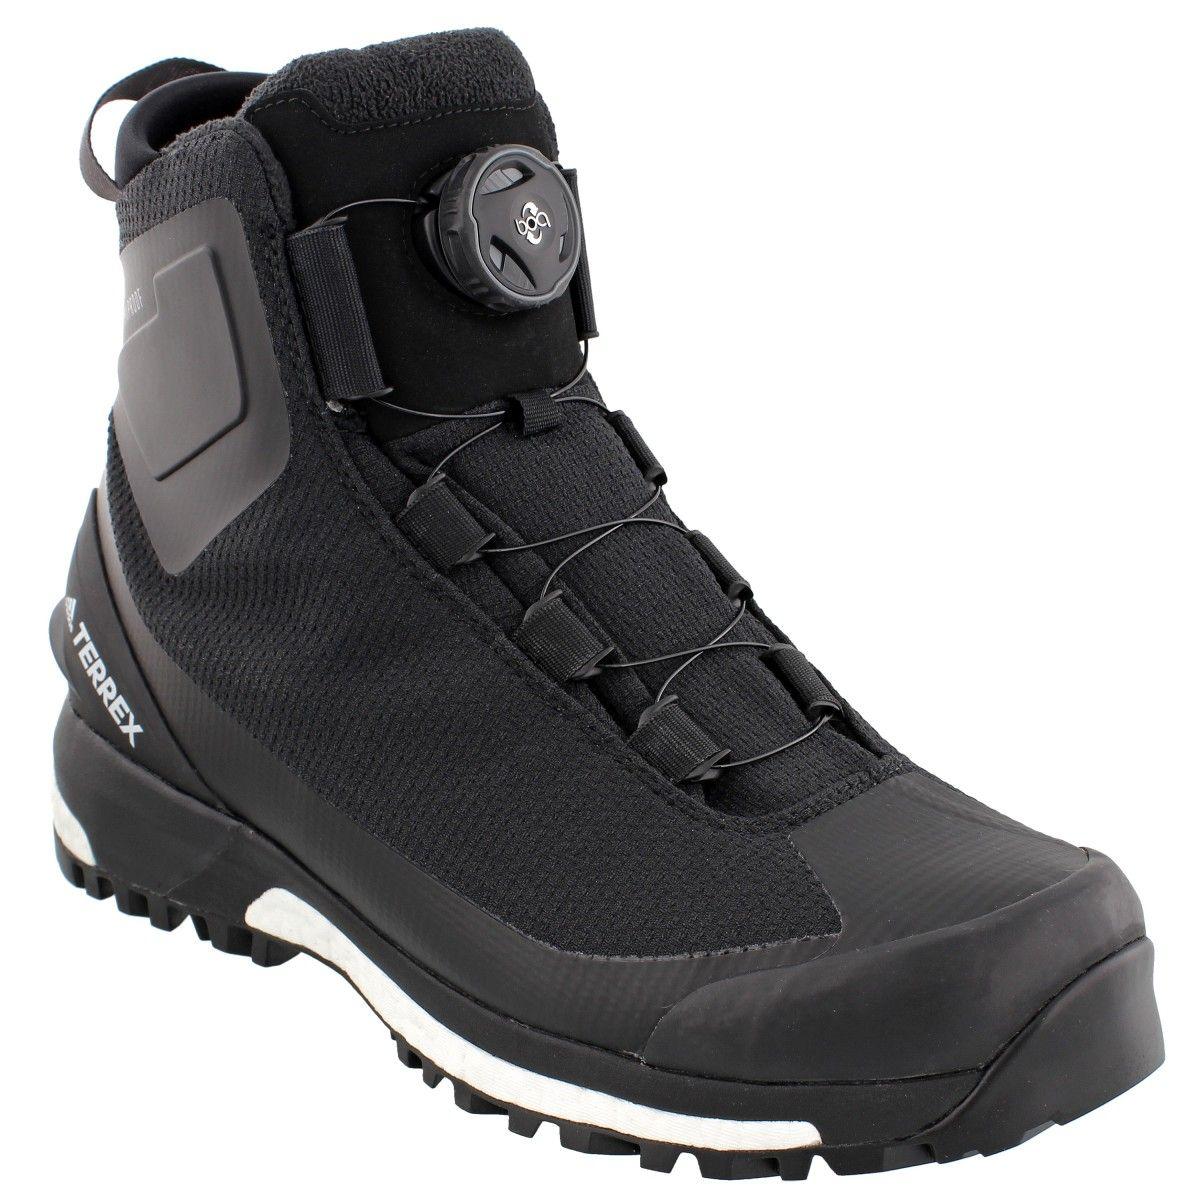 Adidas Terrex Conrax BOA | Mens winter boots, Hiking fashion